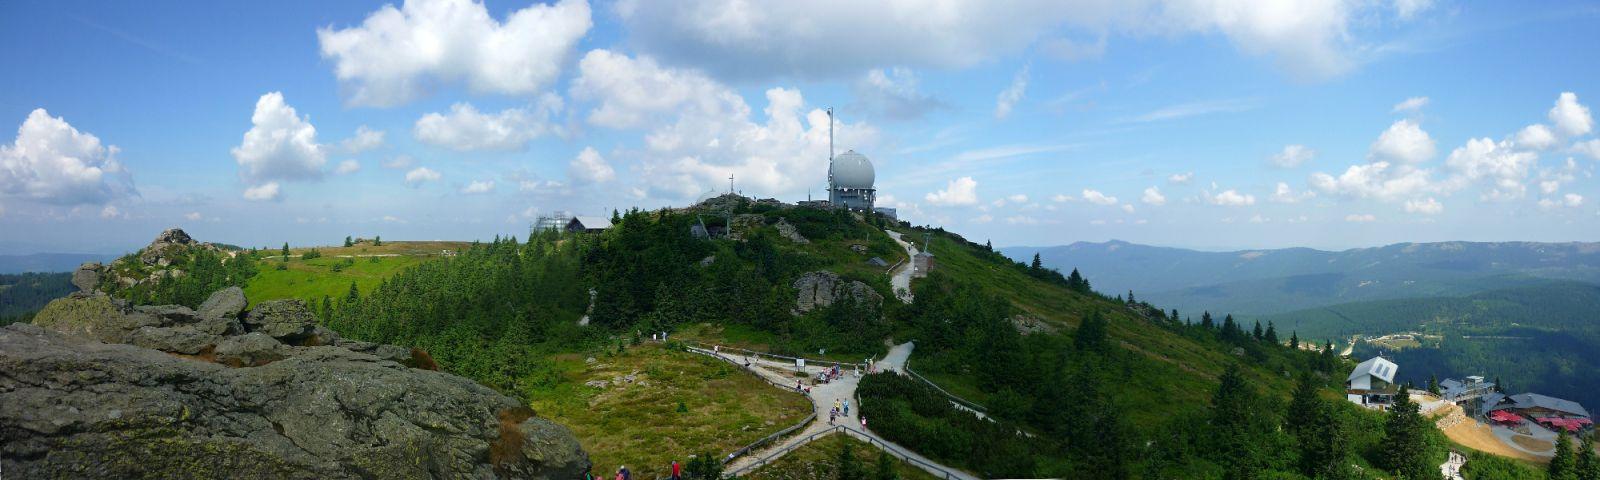 Großer Arber - červenec 2013 panorama